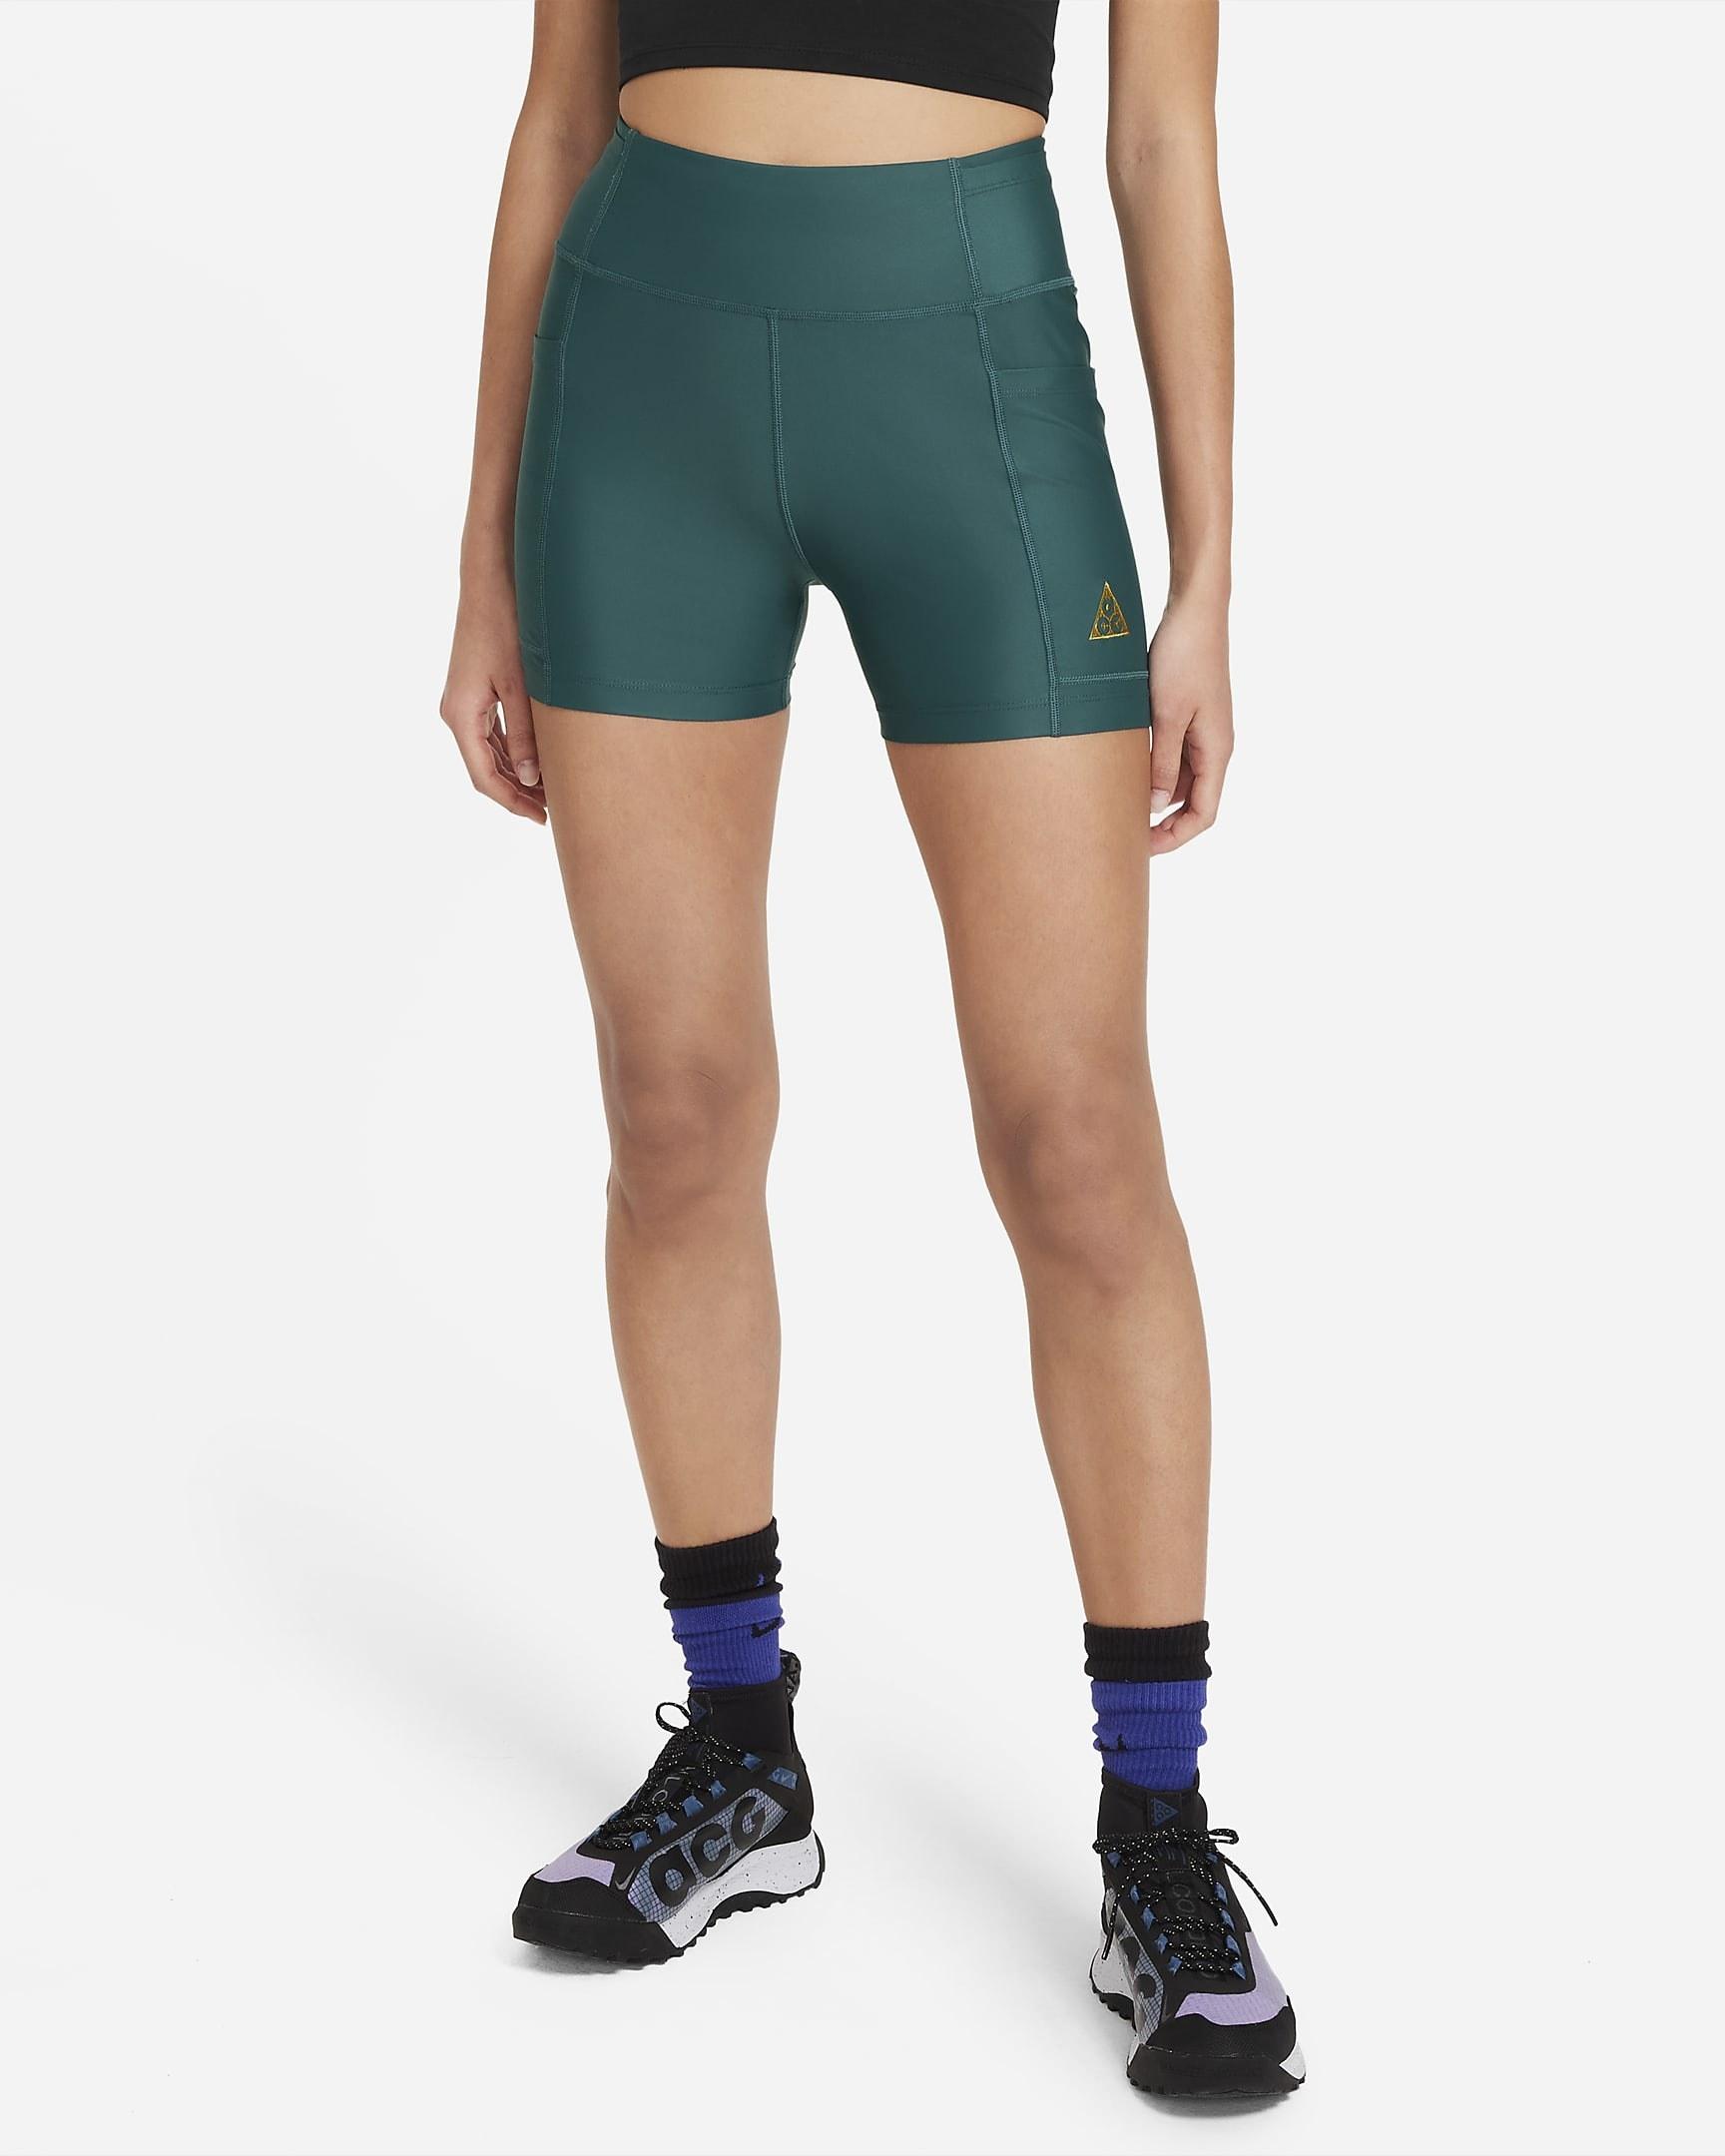 Model wearing deep green biker shorts